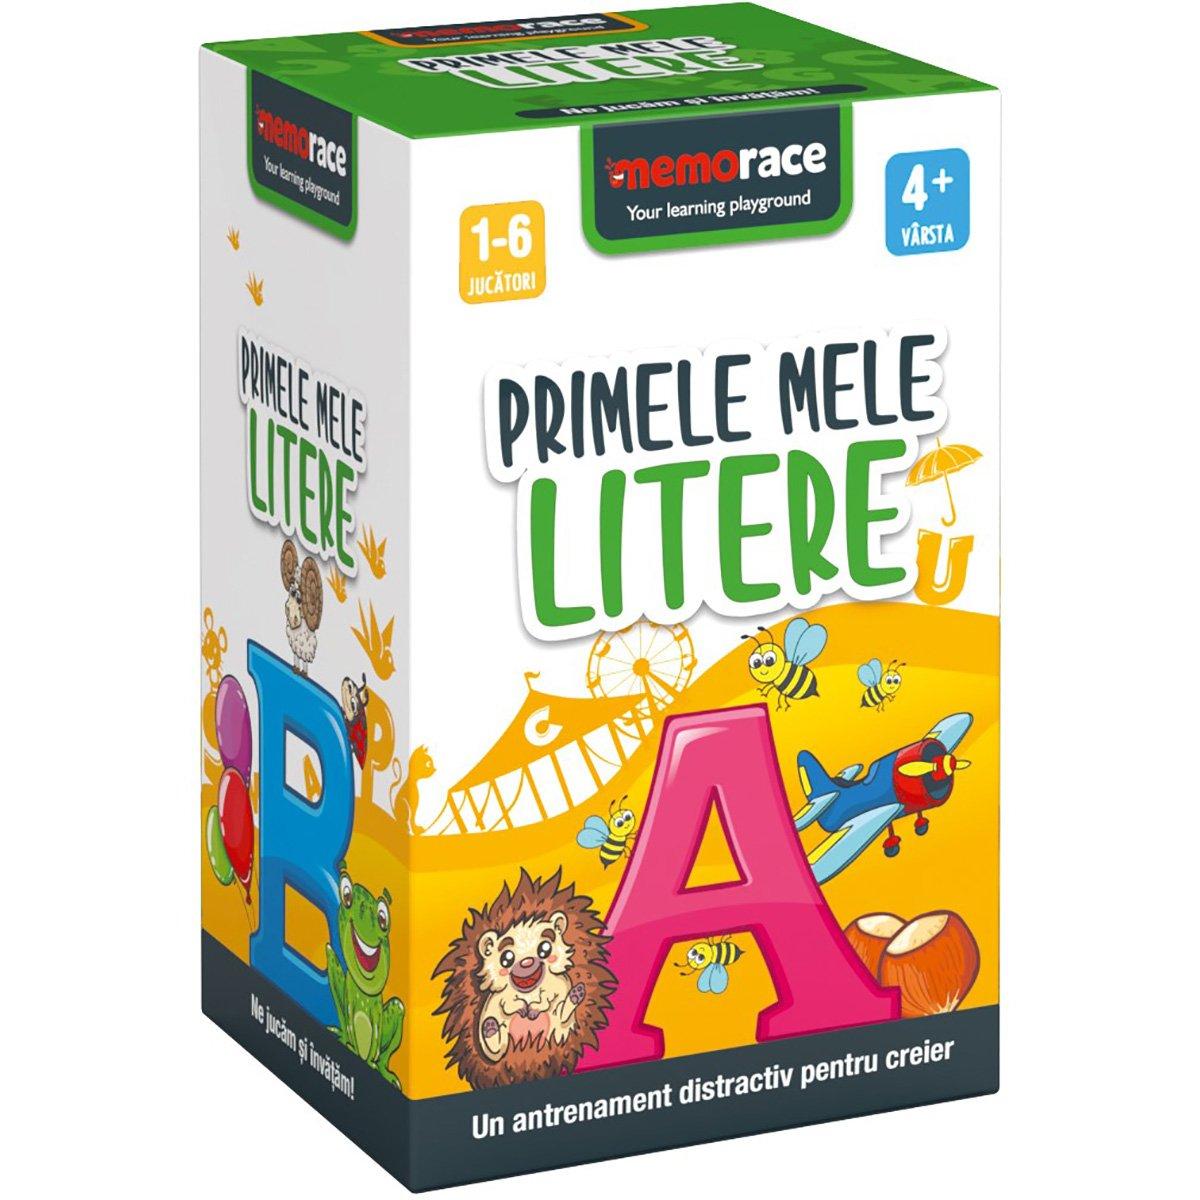 Joc Educativ Memorace, Primele Mele Litere